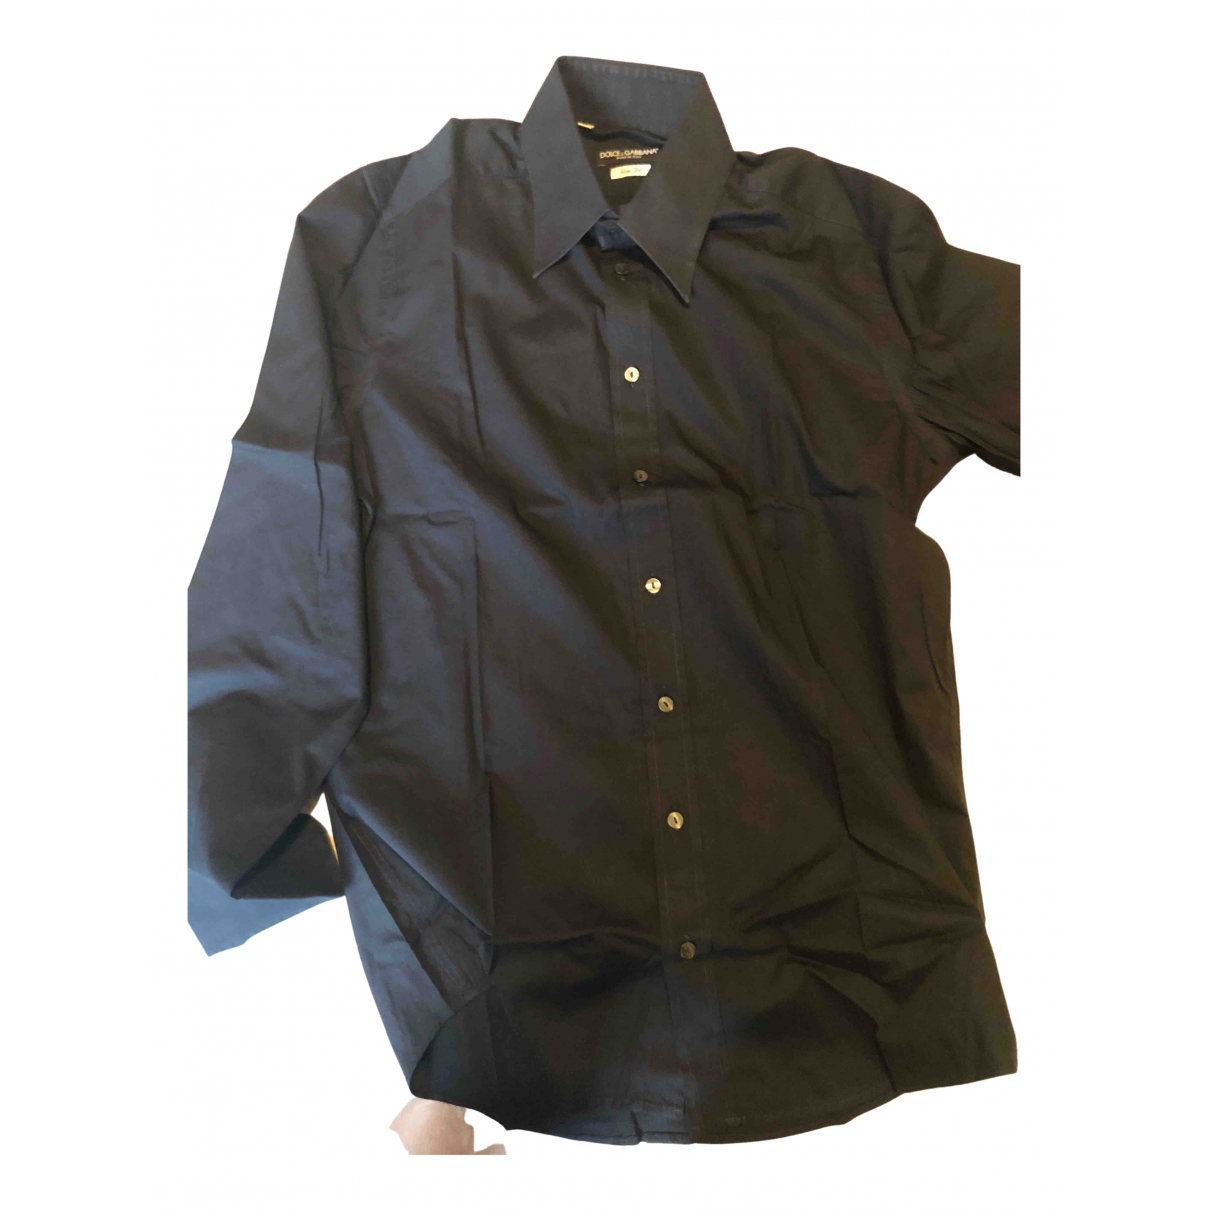 Dolce & Gabbana N Black Cotton Shirts for Men 41 EU (tour de cou / collar)